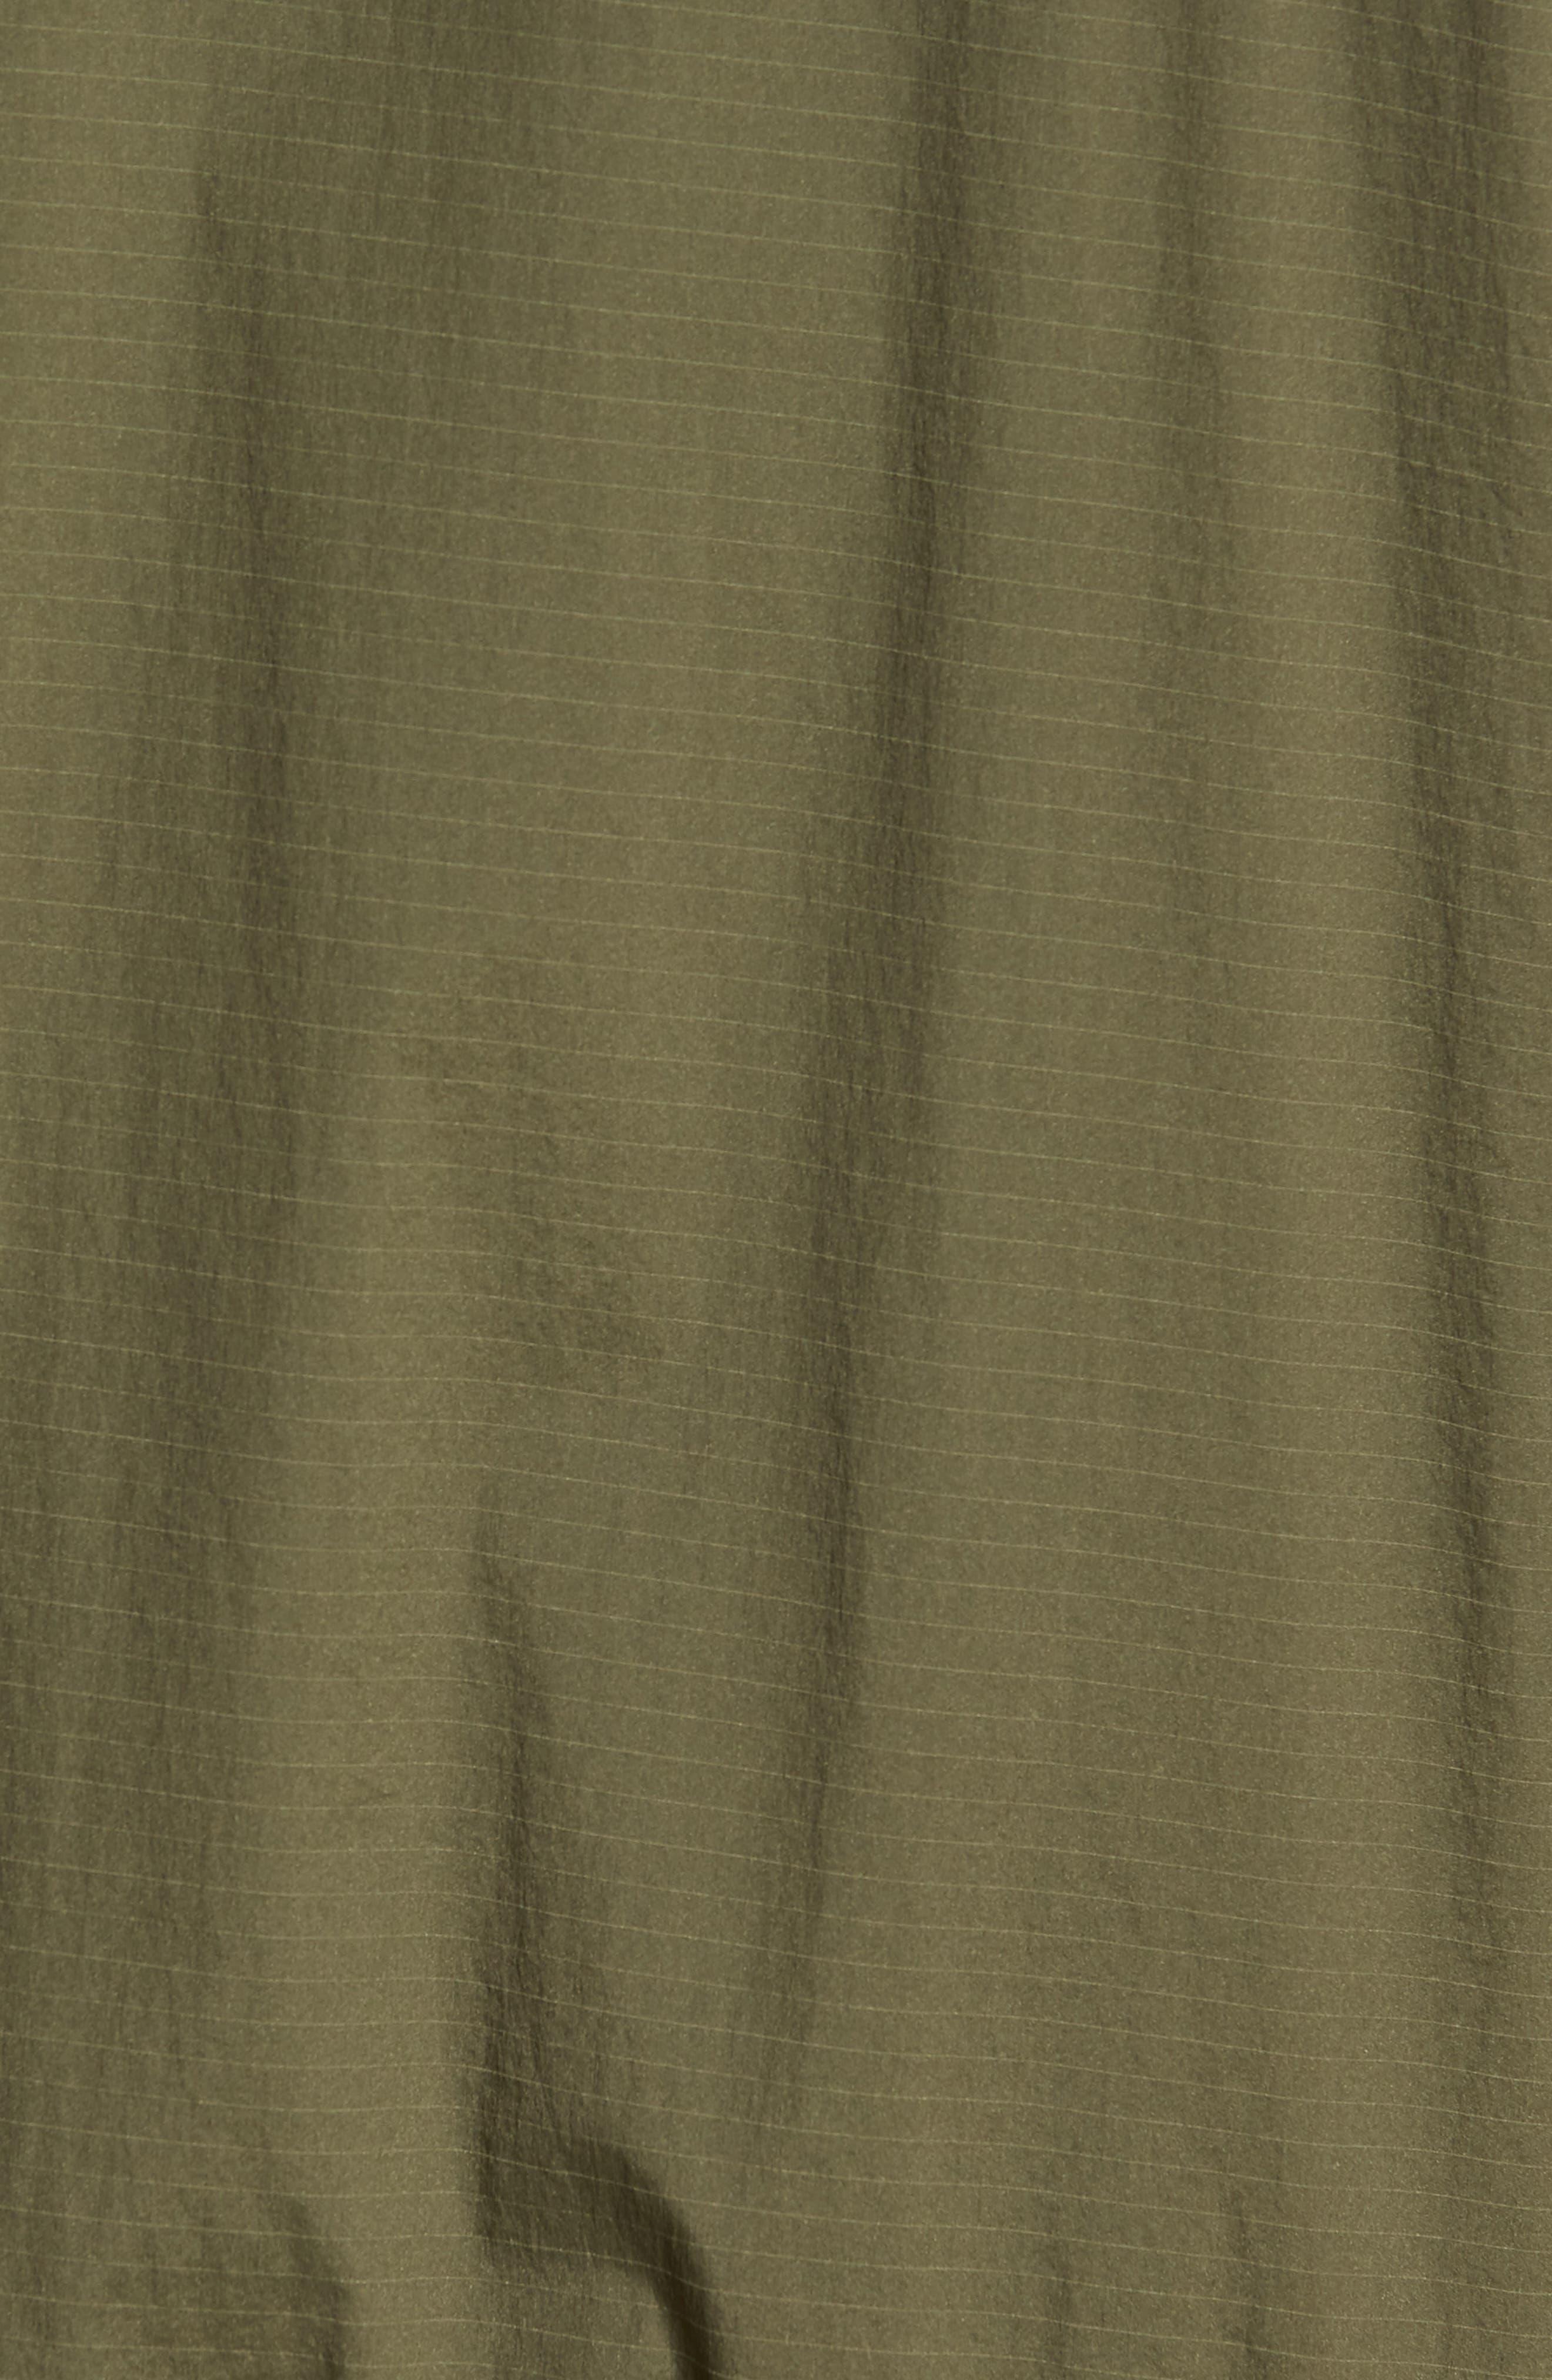 Camdan Ripstop Jacket,                             Alternate thumbnail 6, color,                             359